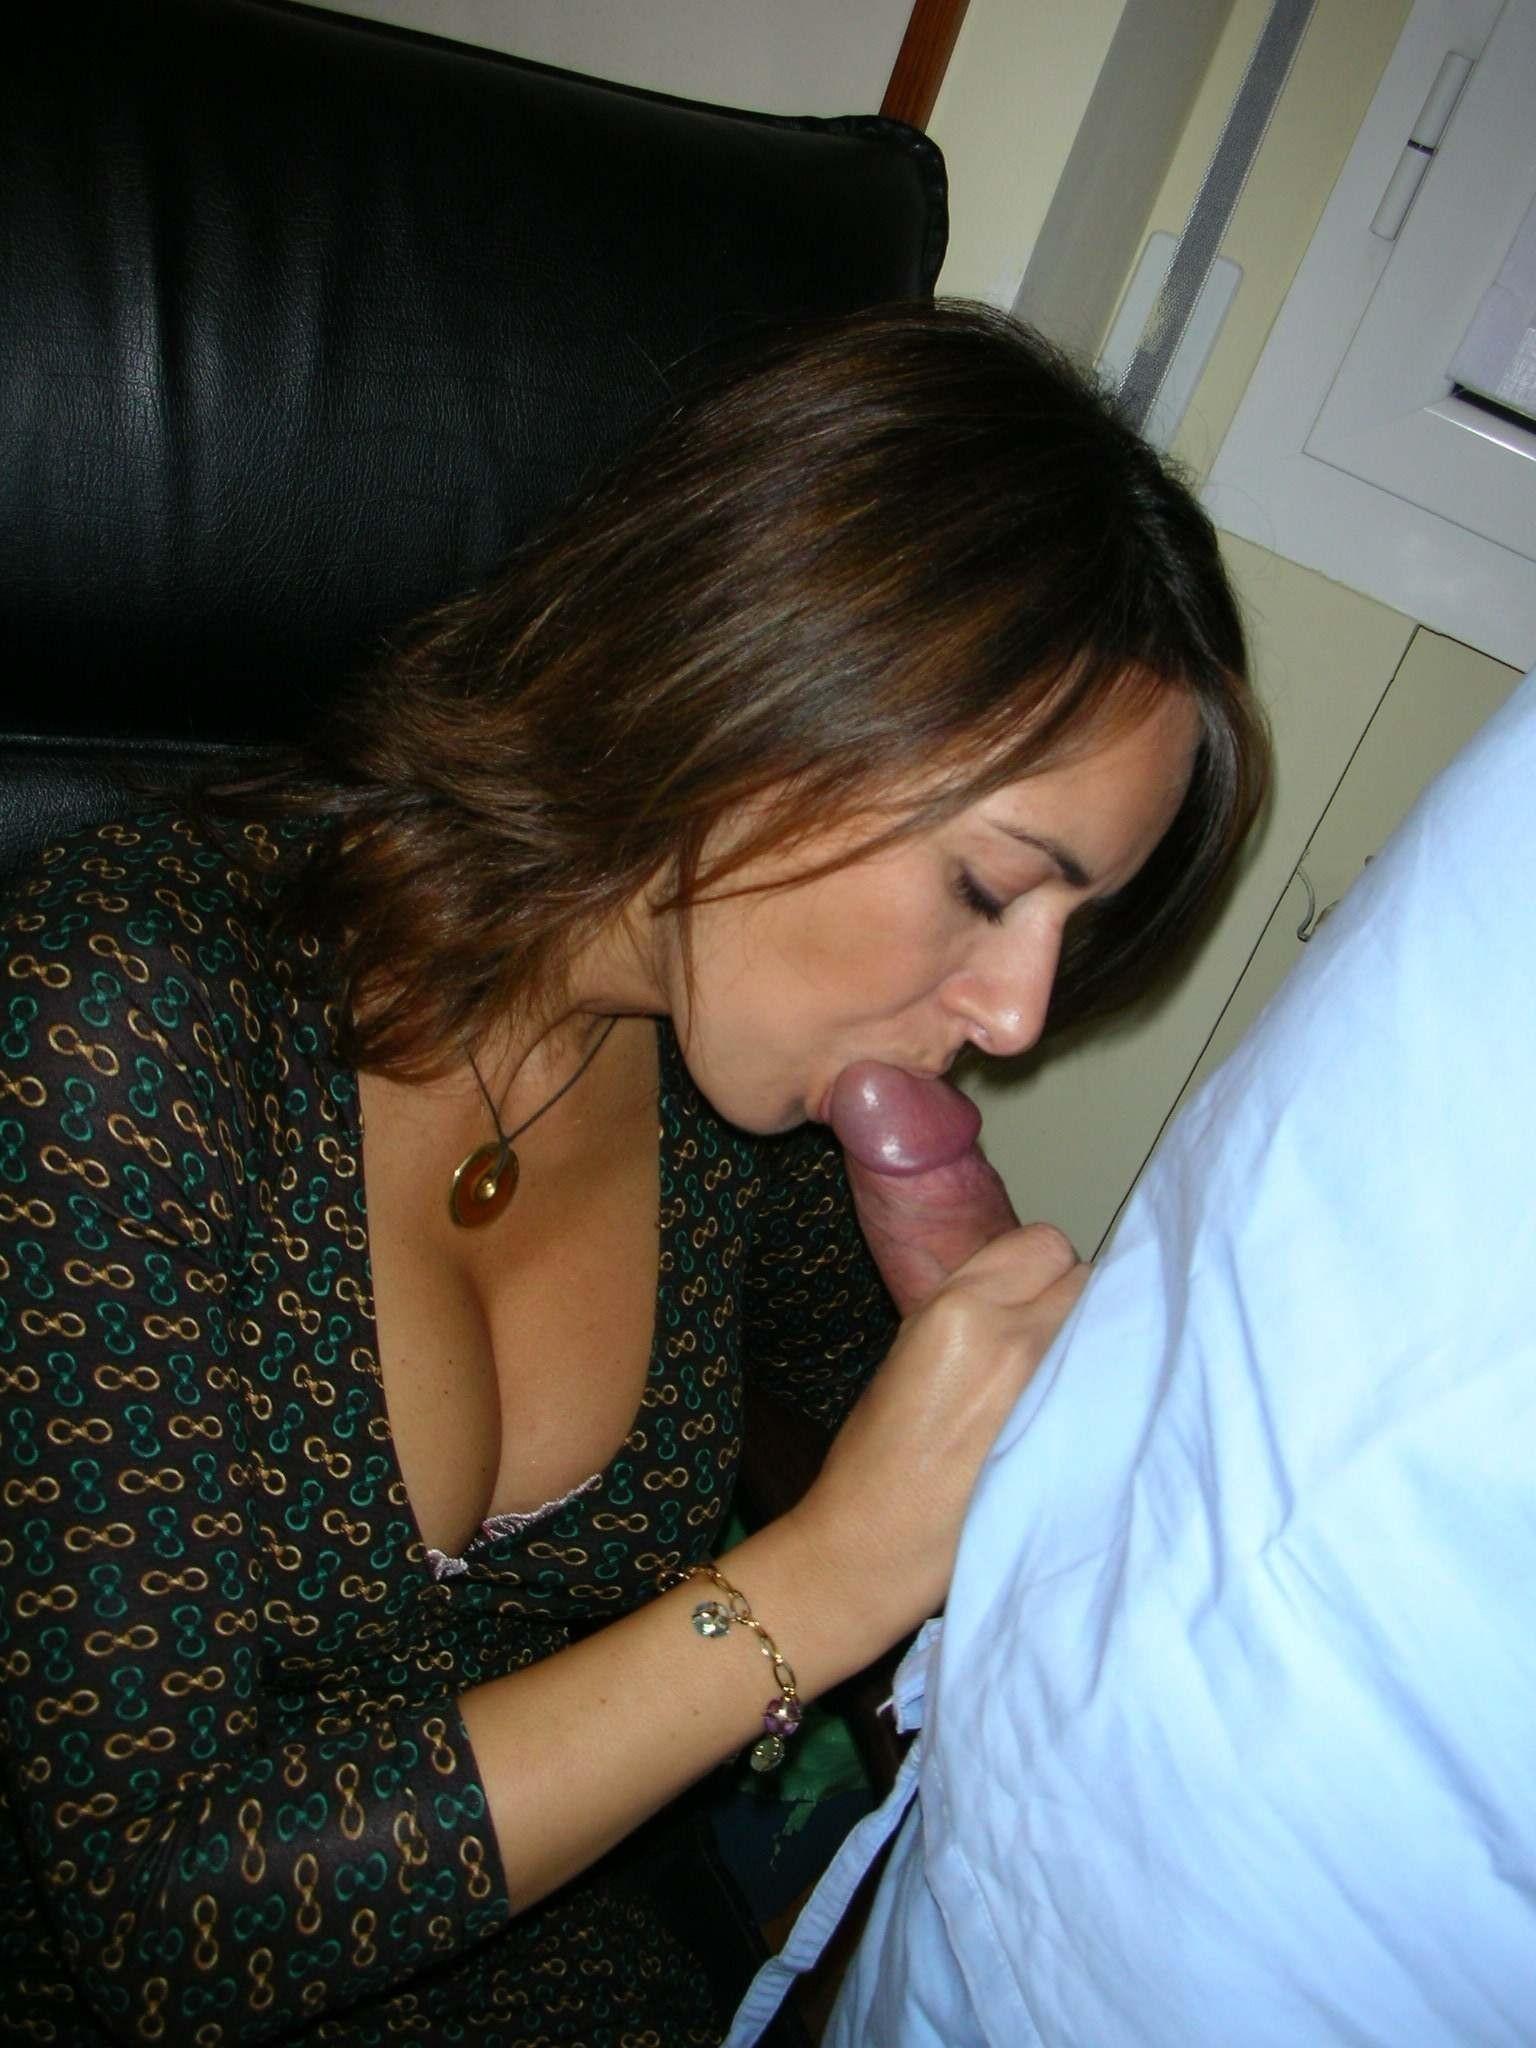 wild hardcore daisy chain ass licking lesbians